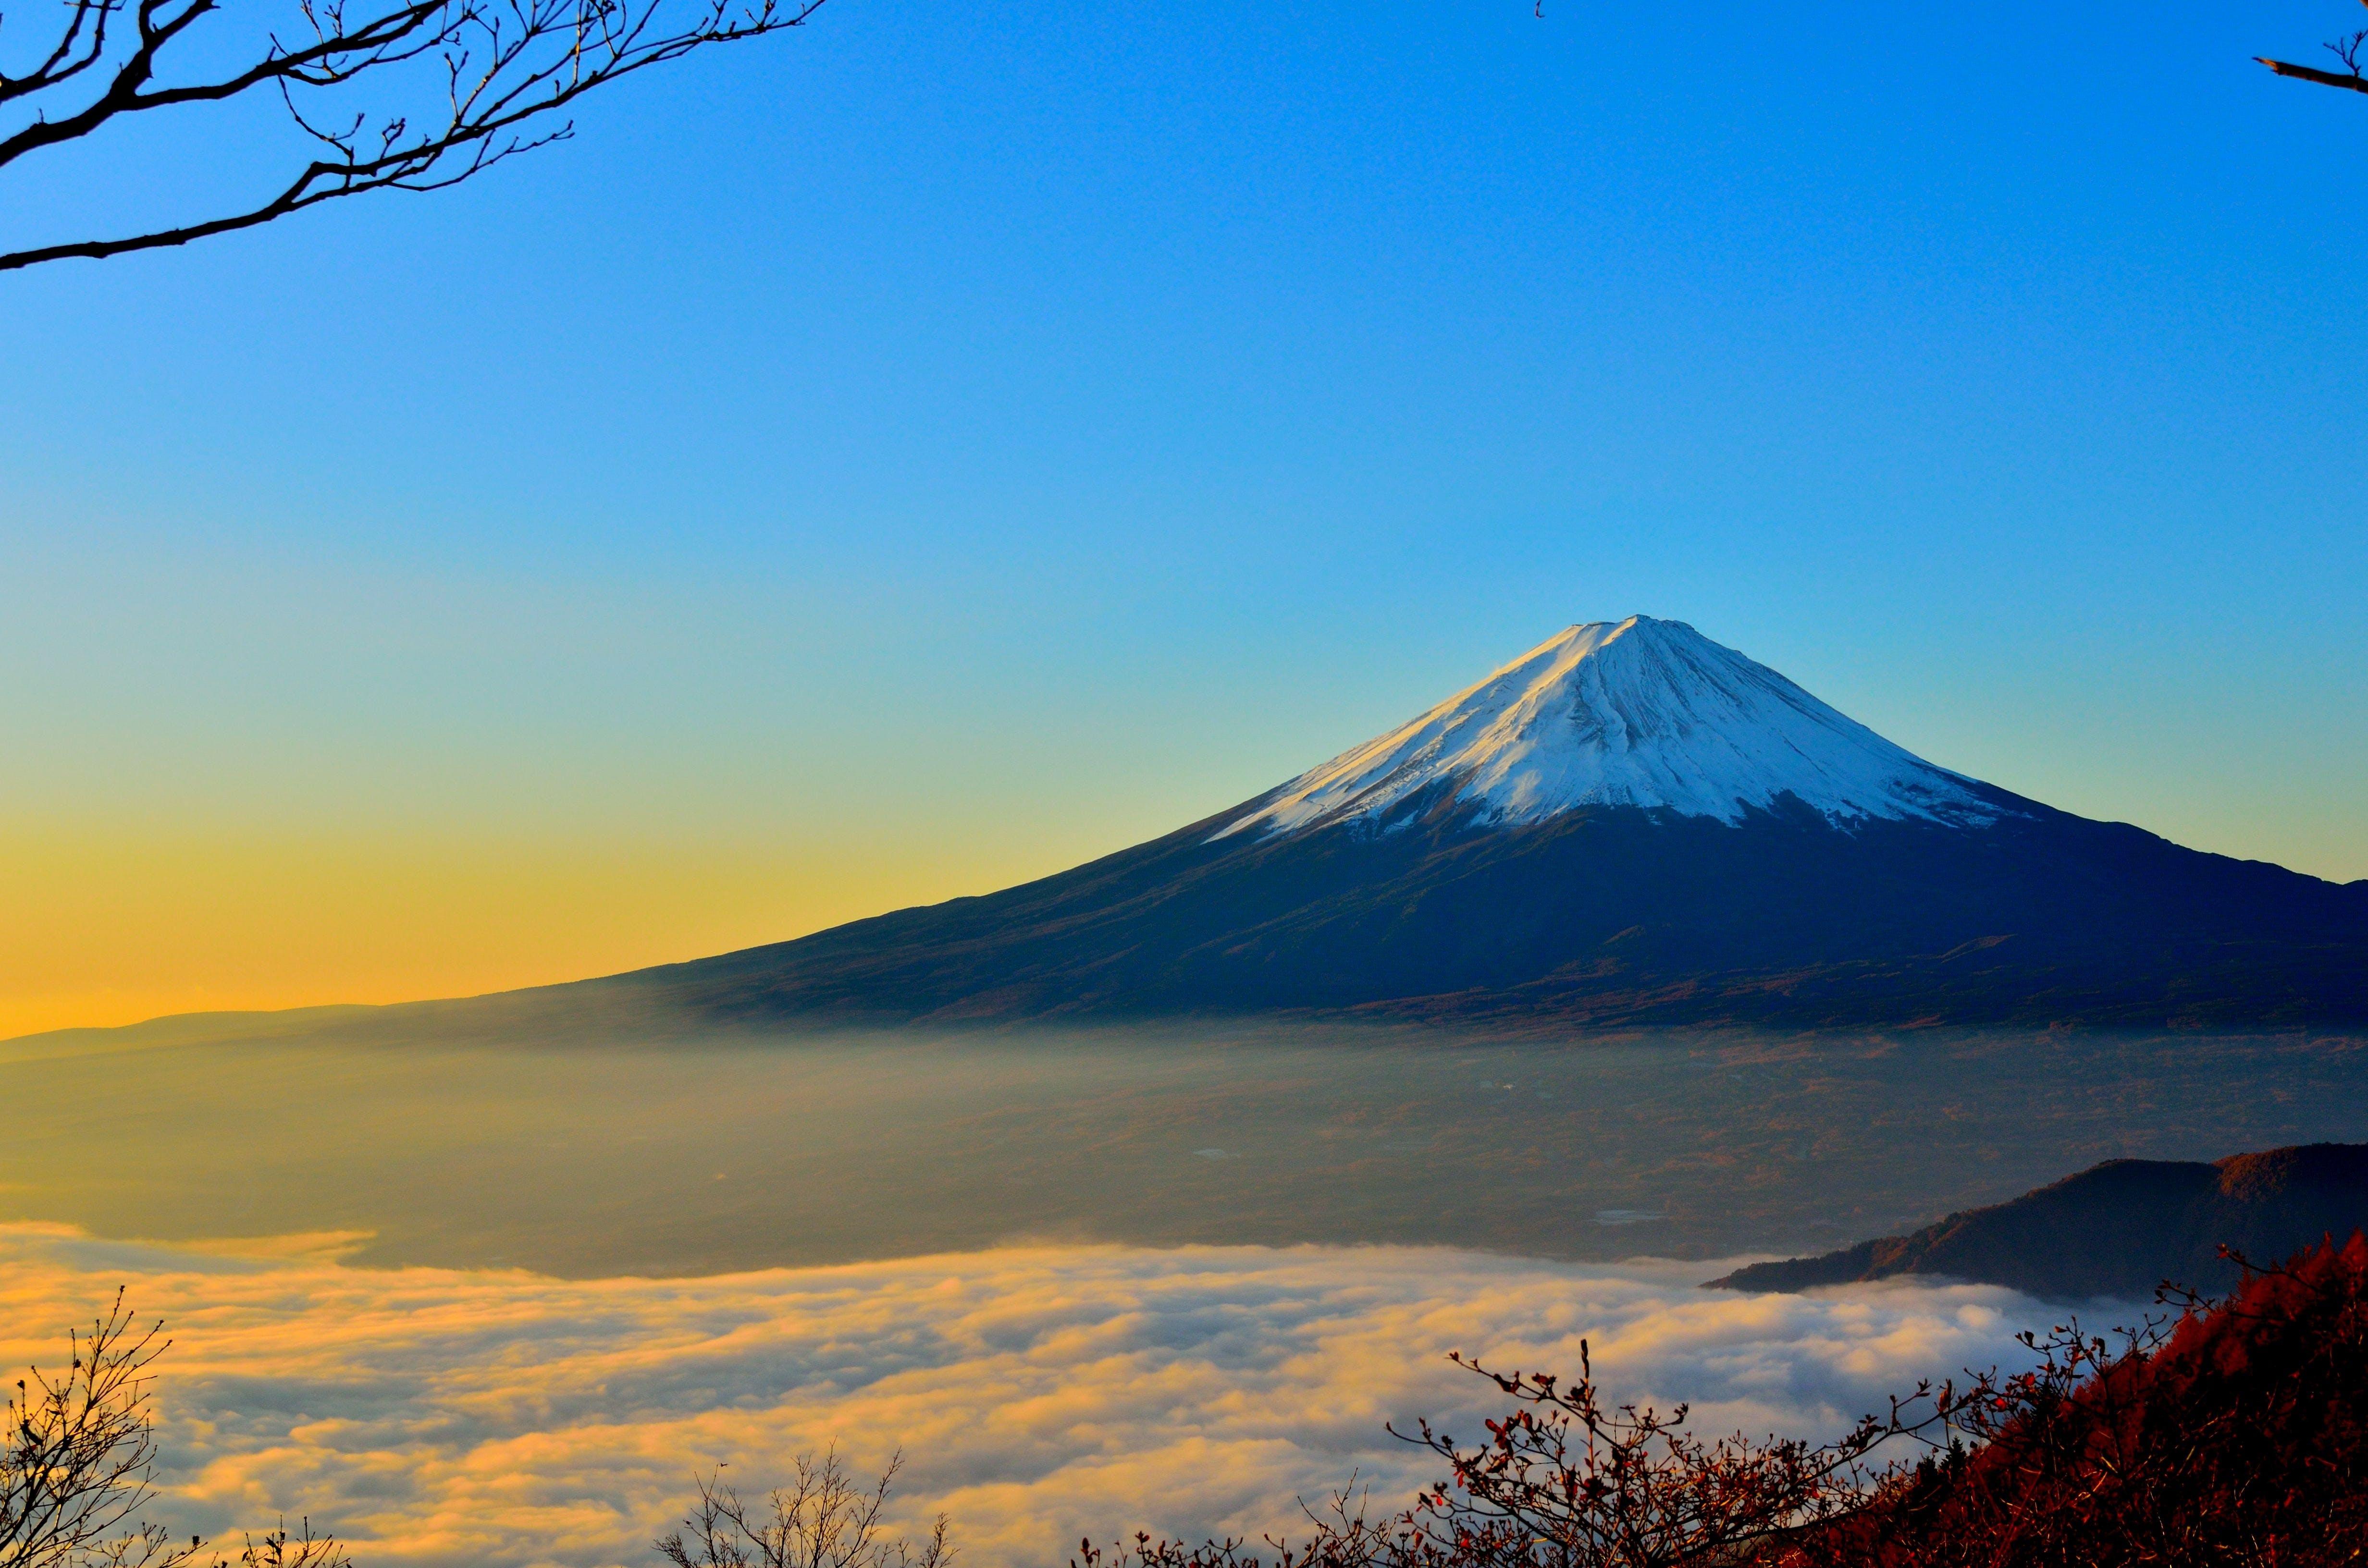 Kostnadsfri bild av bakgrundsbilder mac, berg, dimma, fuji